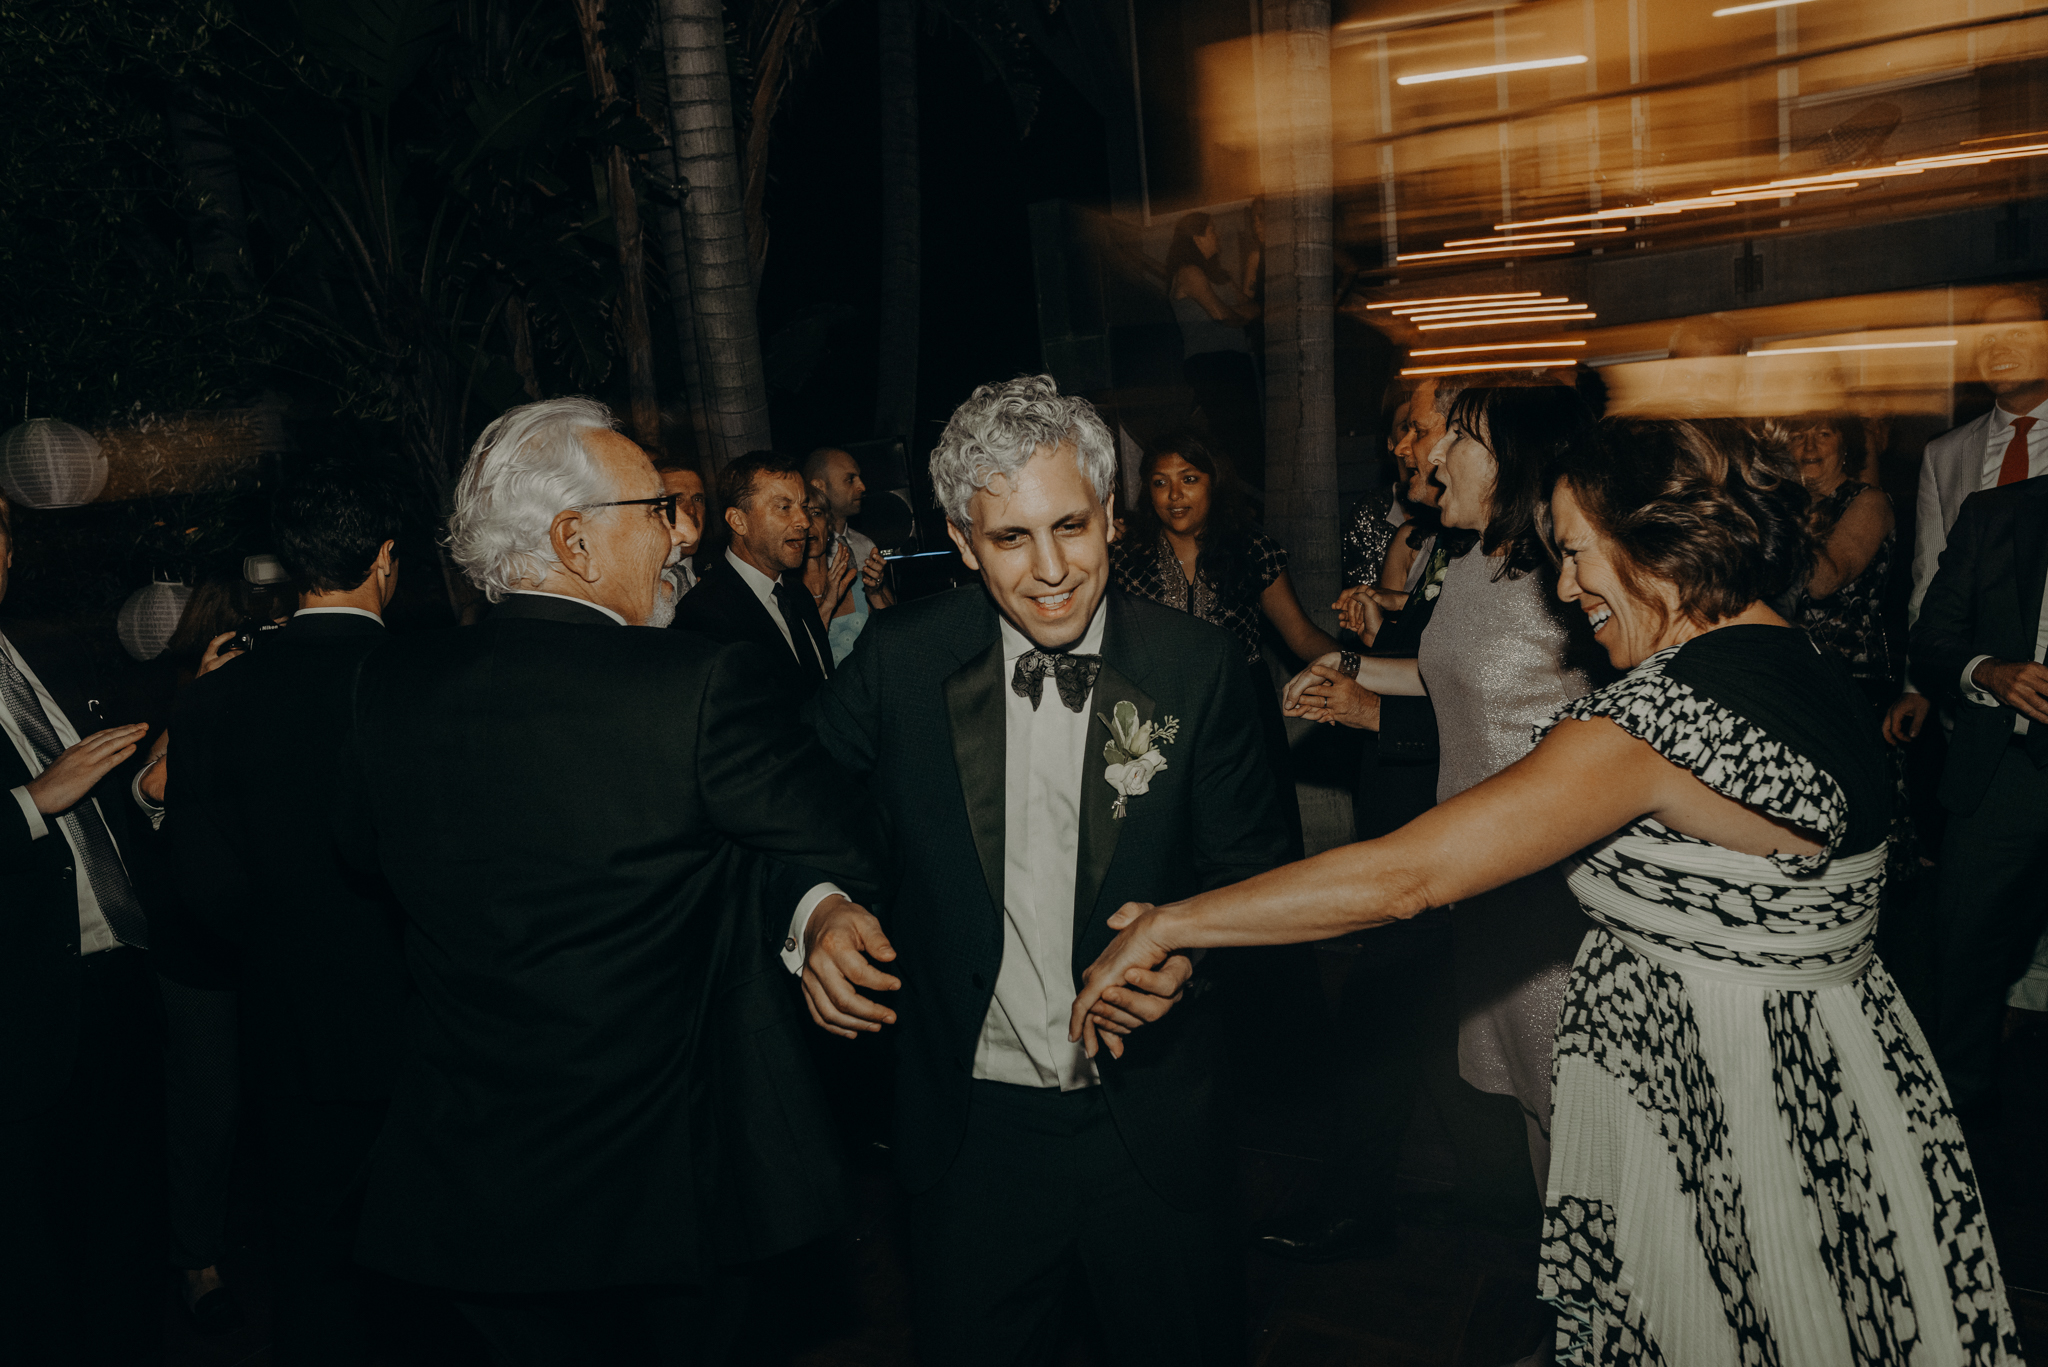 Isaiah + Taylor Photography - Private Estate Backyard Wedding - Beverly Hills - Los Angeles Wedding Photographer - 149.jpg